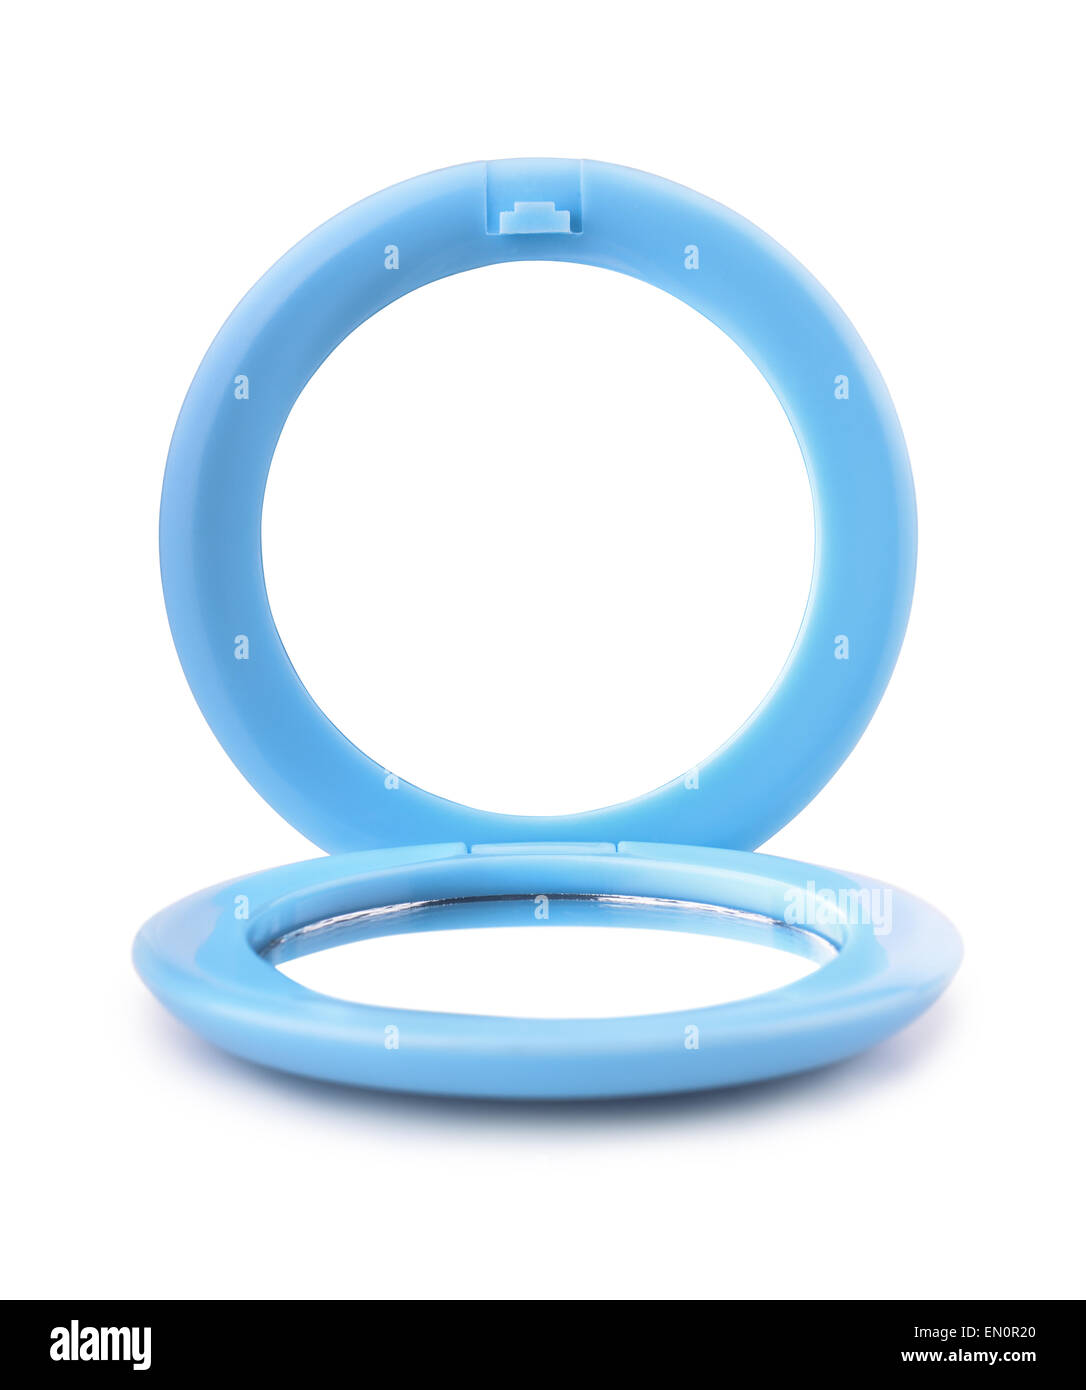 Miroir de poche en plastique bleu isolated on white Photo Stock